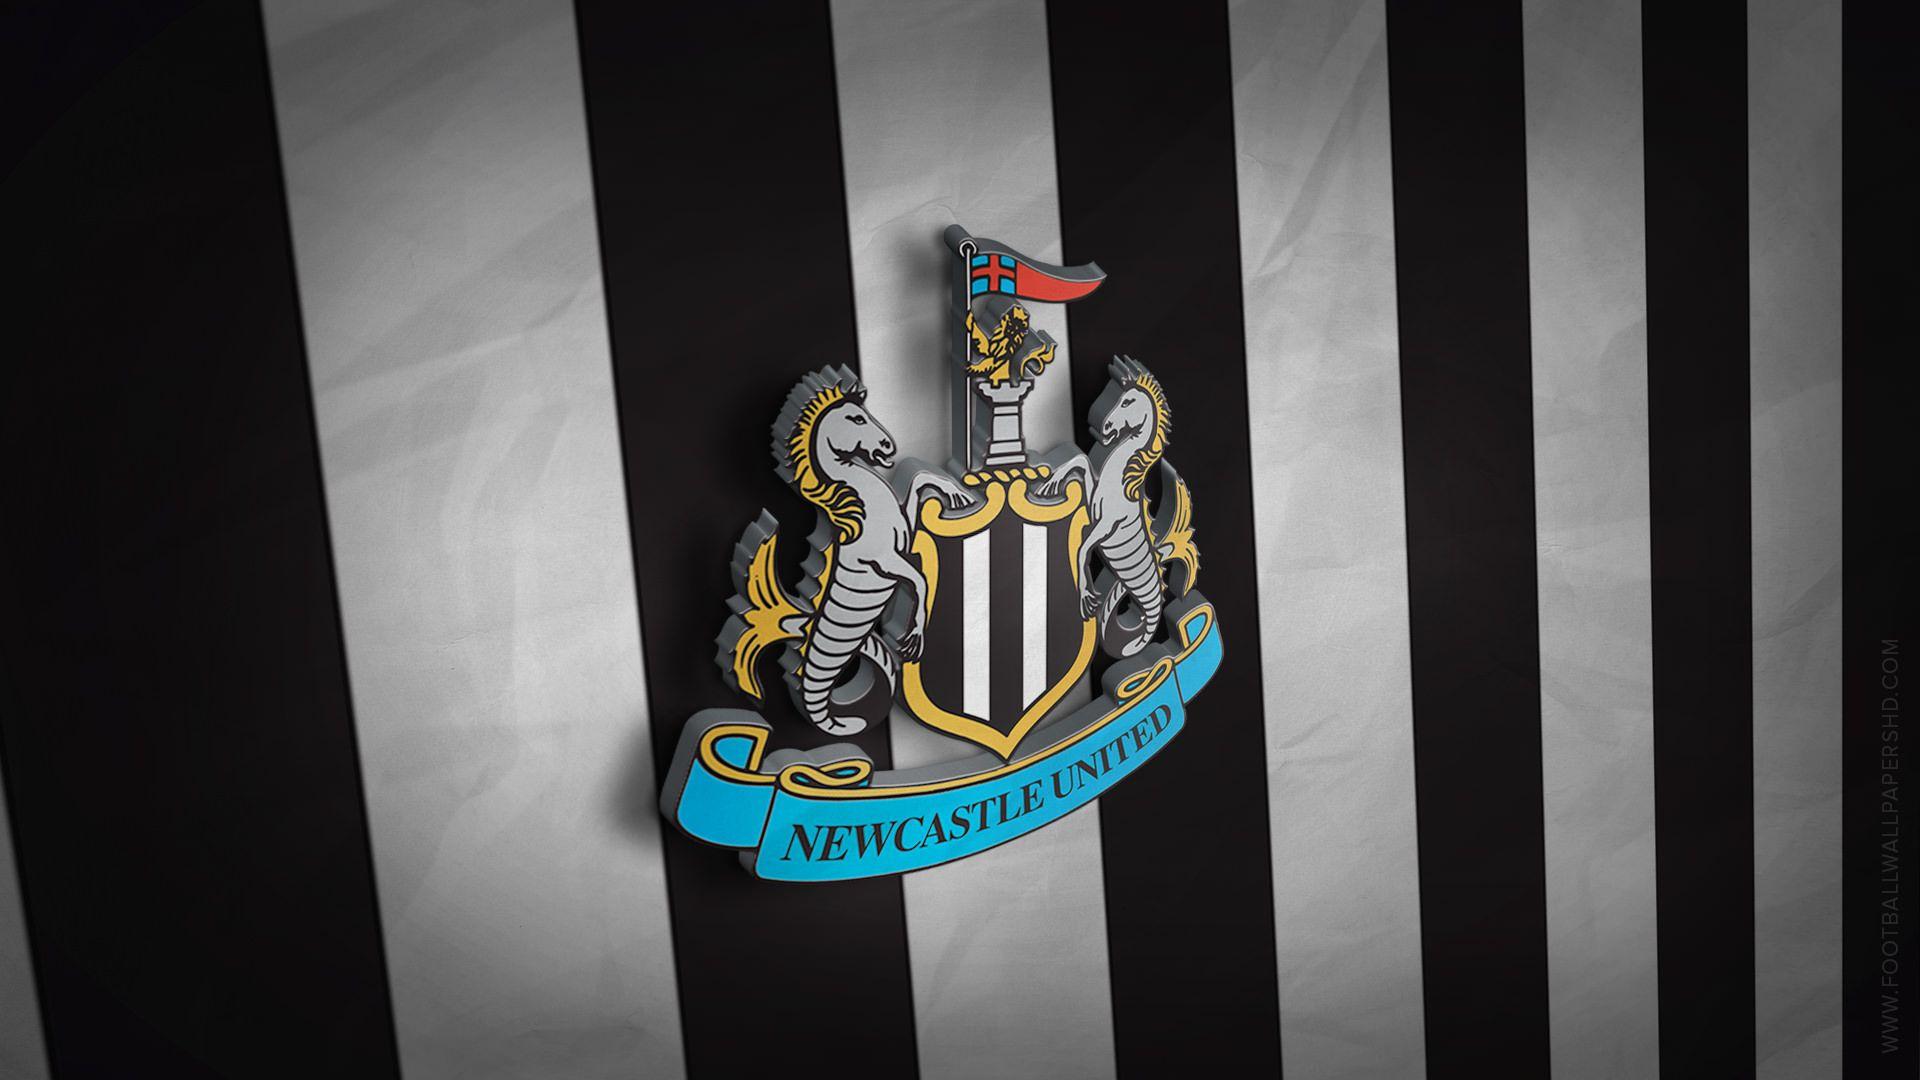 Newcastle United: Newcastle United 3D Logo Wallpaper